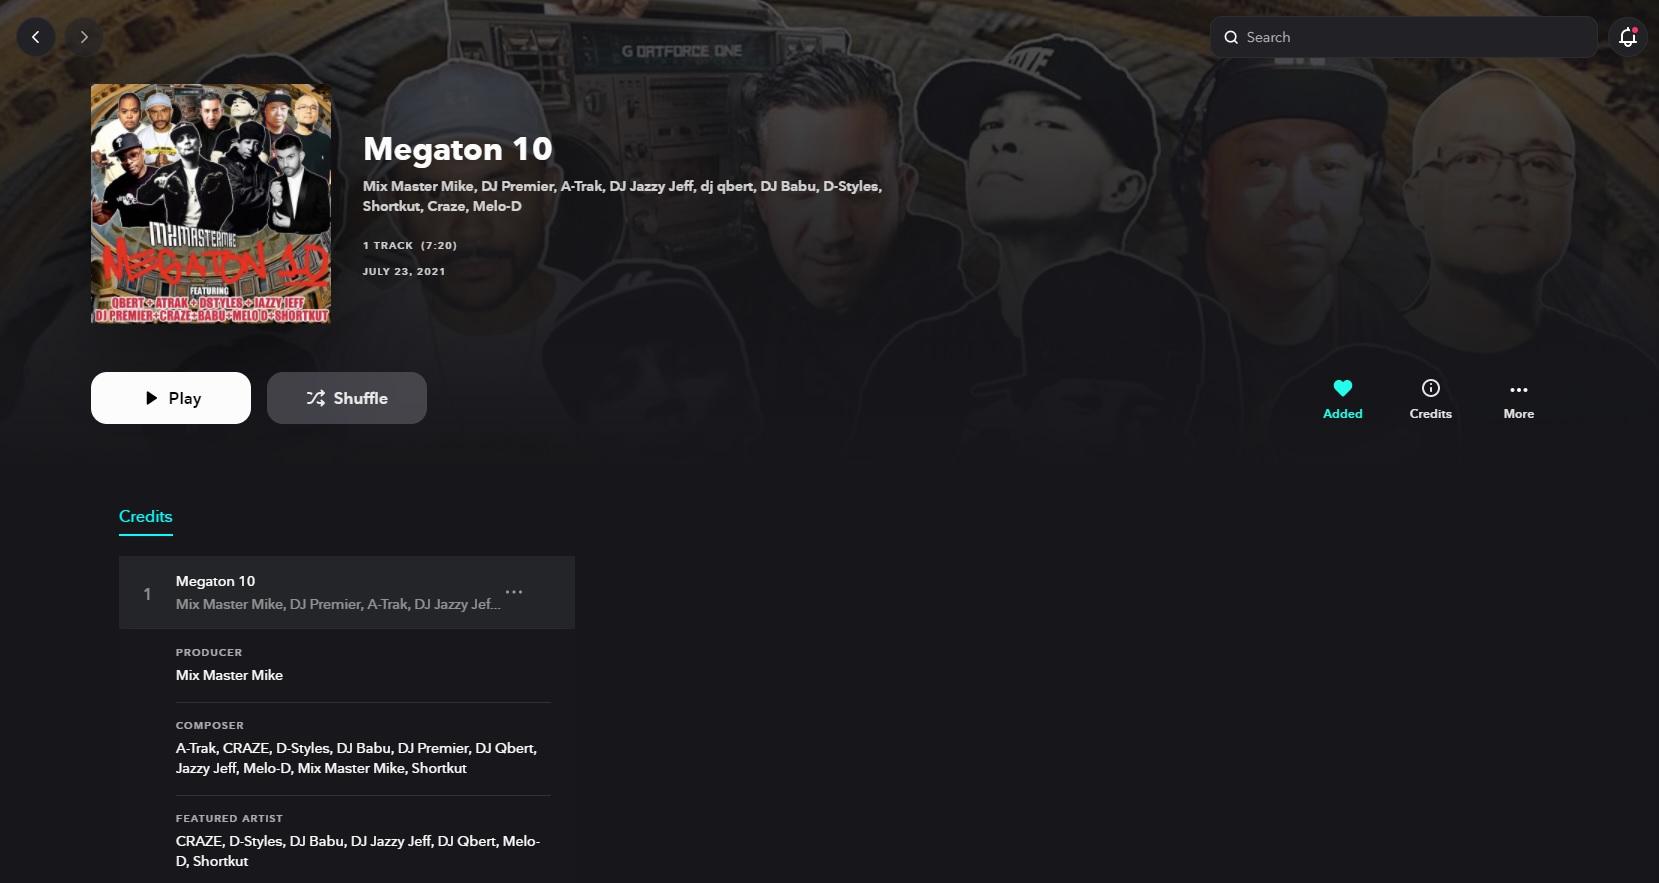 Megaton 10 by A-Trak, DJ Craze, D-Styles, DJ Babu, DJ Premier, DJ Qbert, DJ Jazzy Jeff, Melo-D, Mix Master Mike, Shortkut